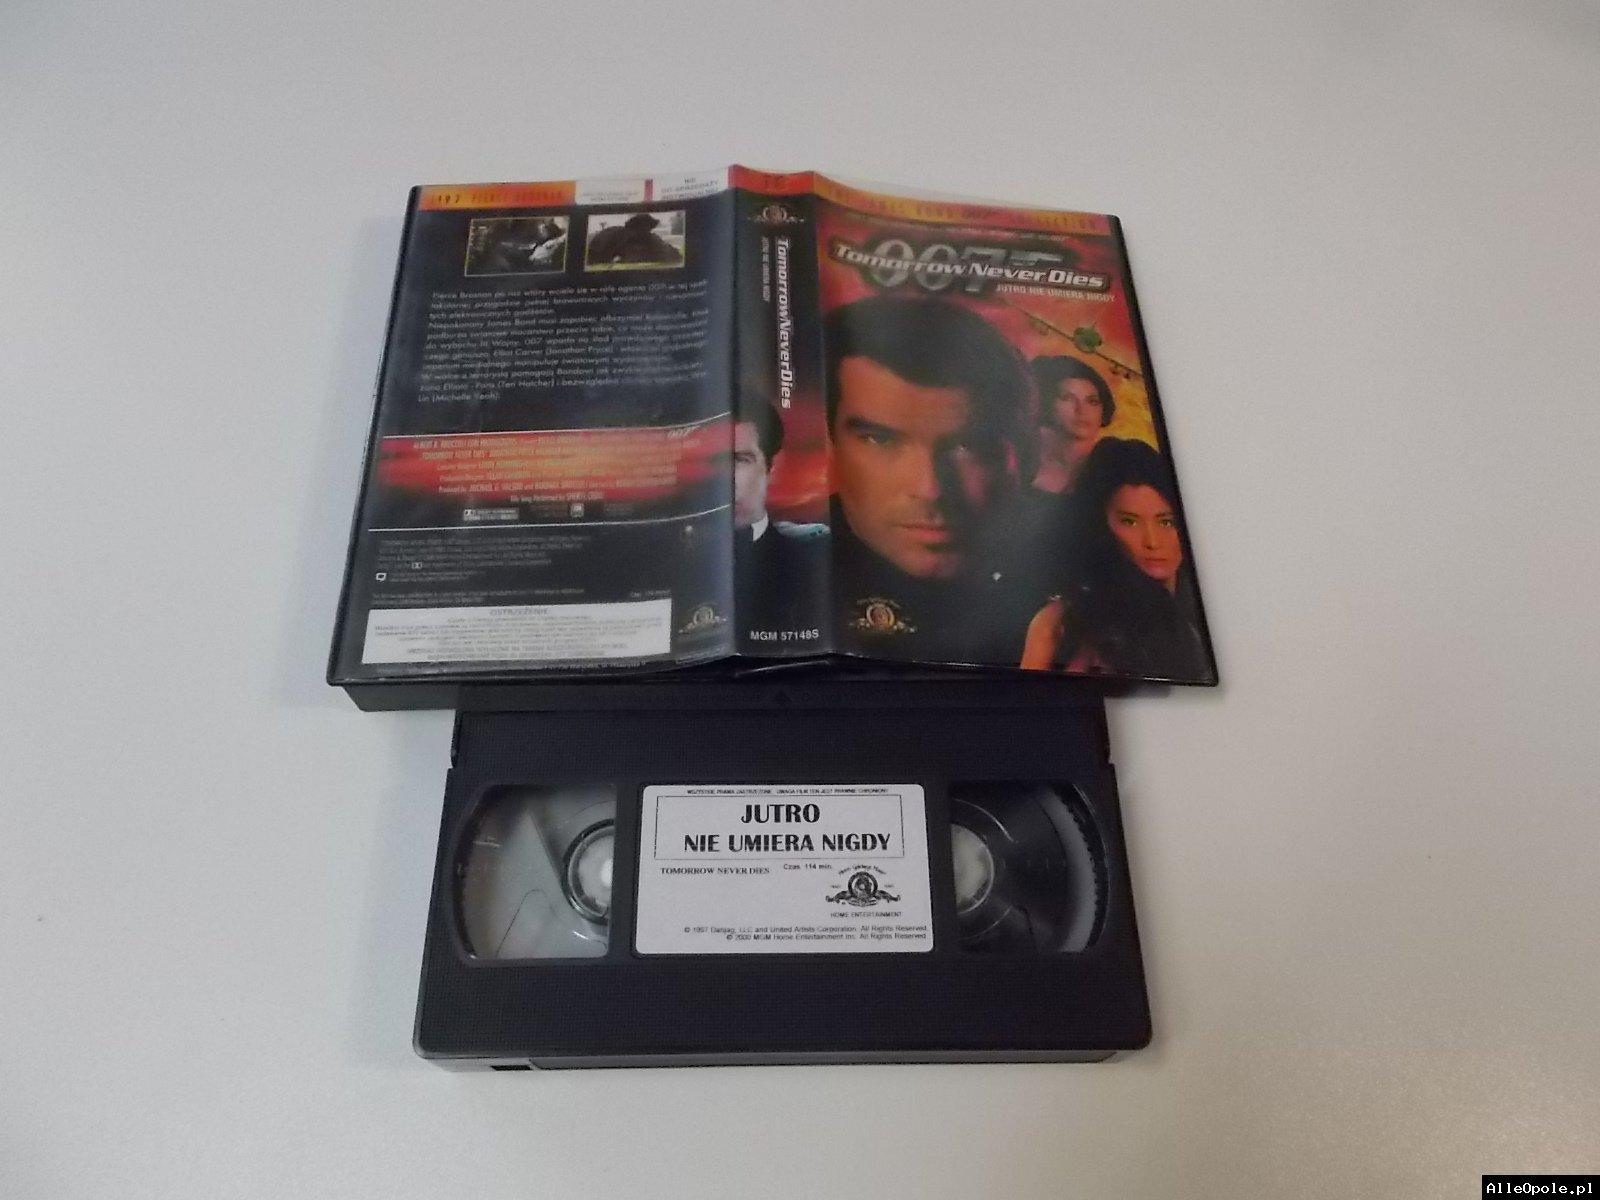 007 JUTRO NIE UMIERA NIGDY - VHS Kaseta Video - Opole 1712